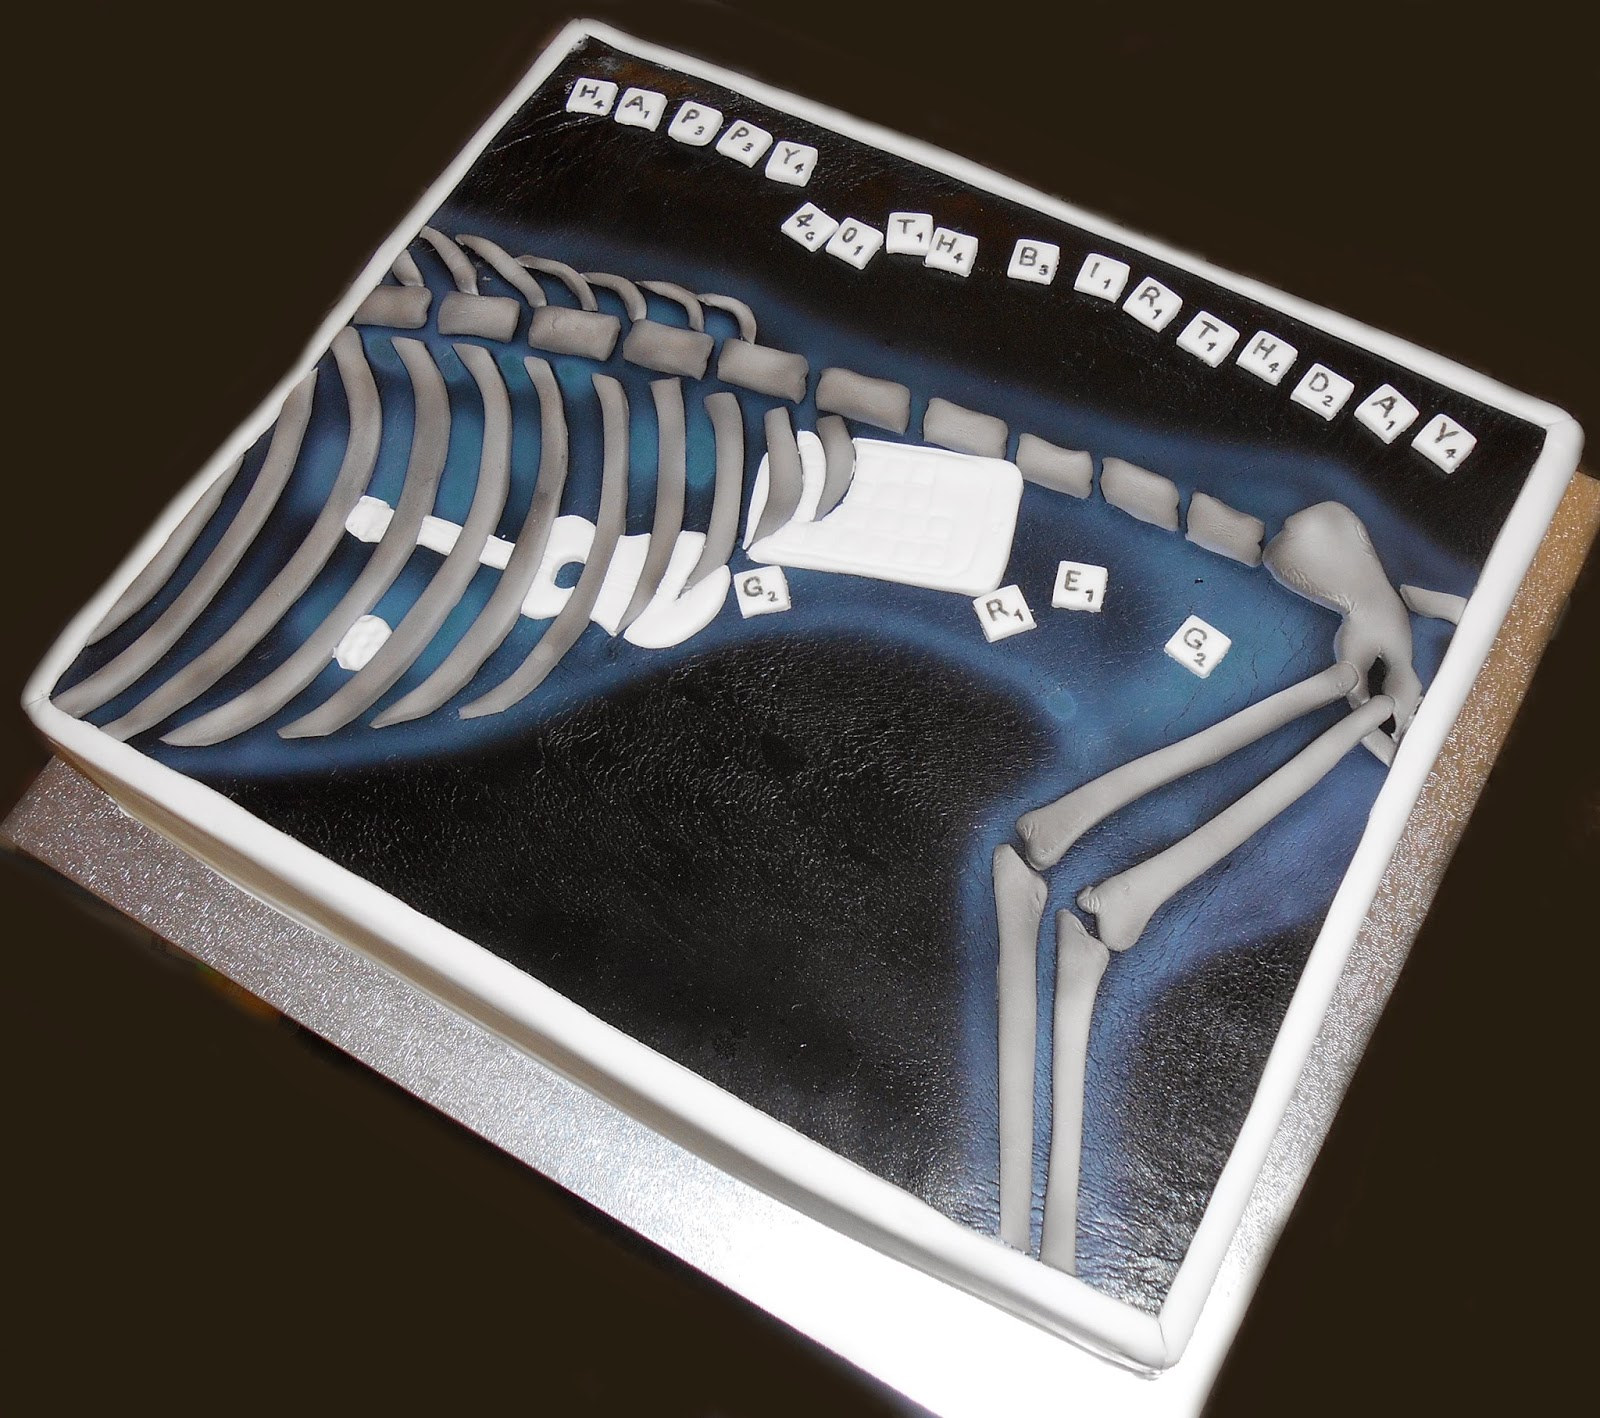 Nadas cakes Dog XRay Birthday Cake by Nadas Cakes Canberra